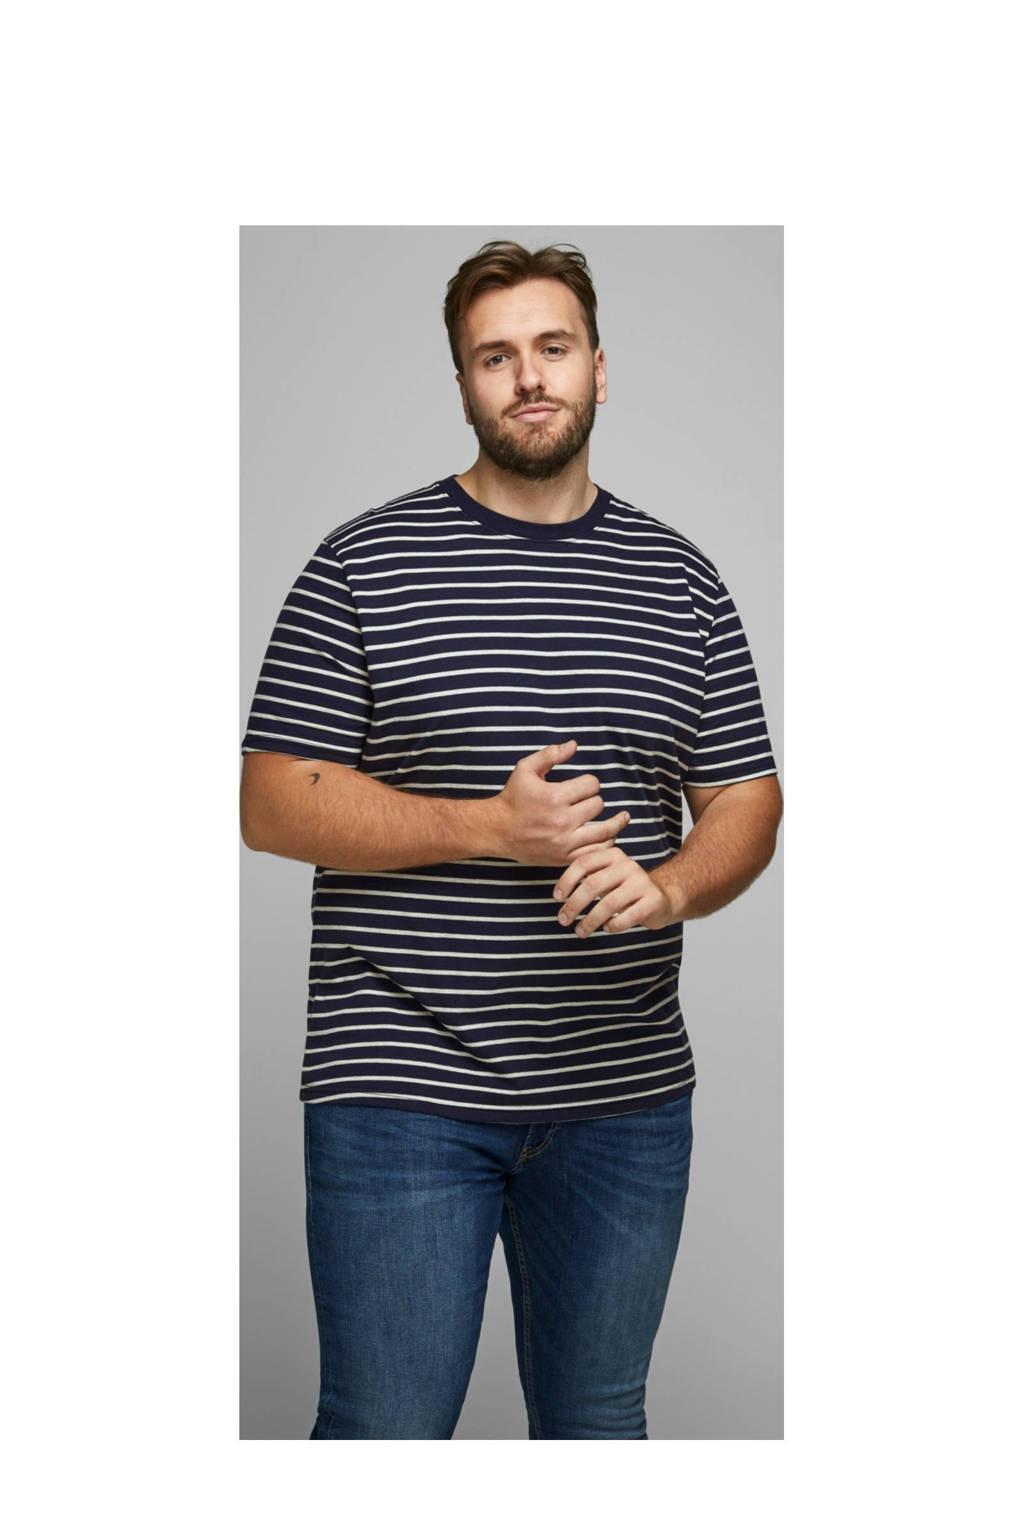 JACK & JONES PLUS SIZE gestreept T-shirt donkerblauw, Donkerblauw